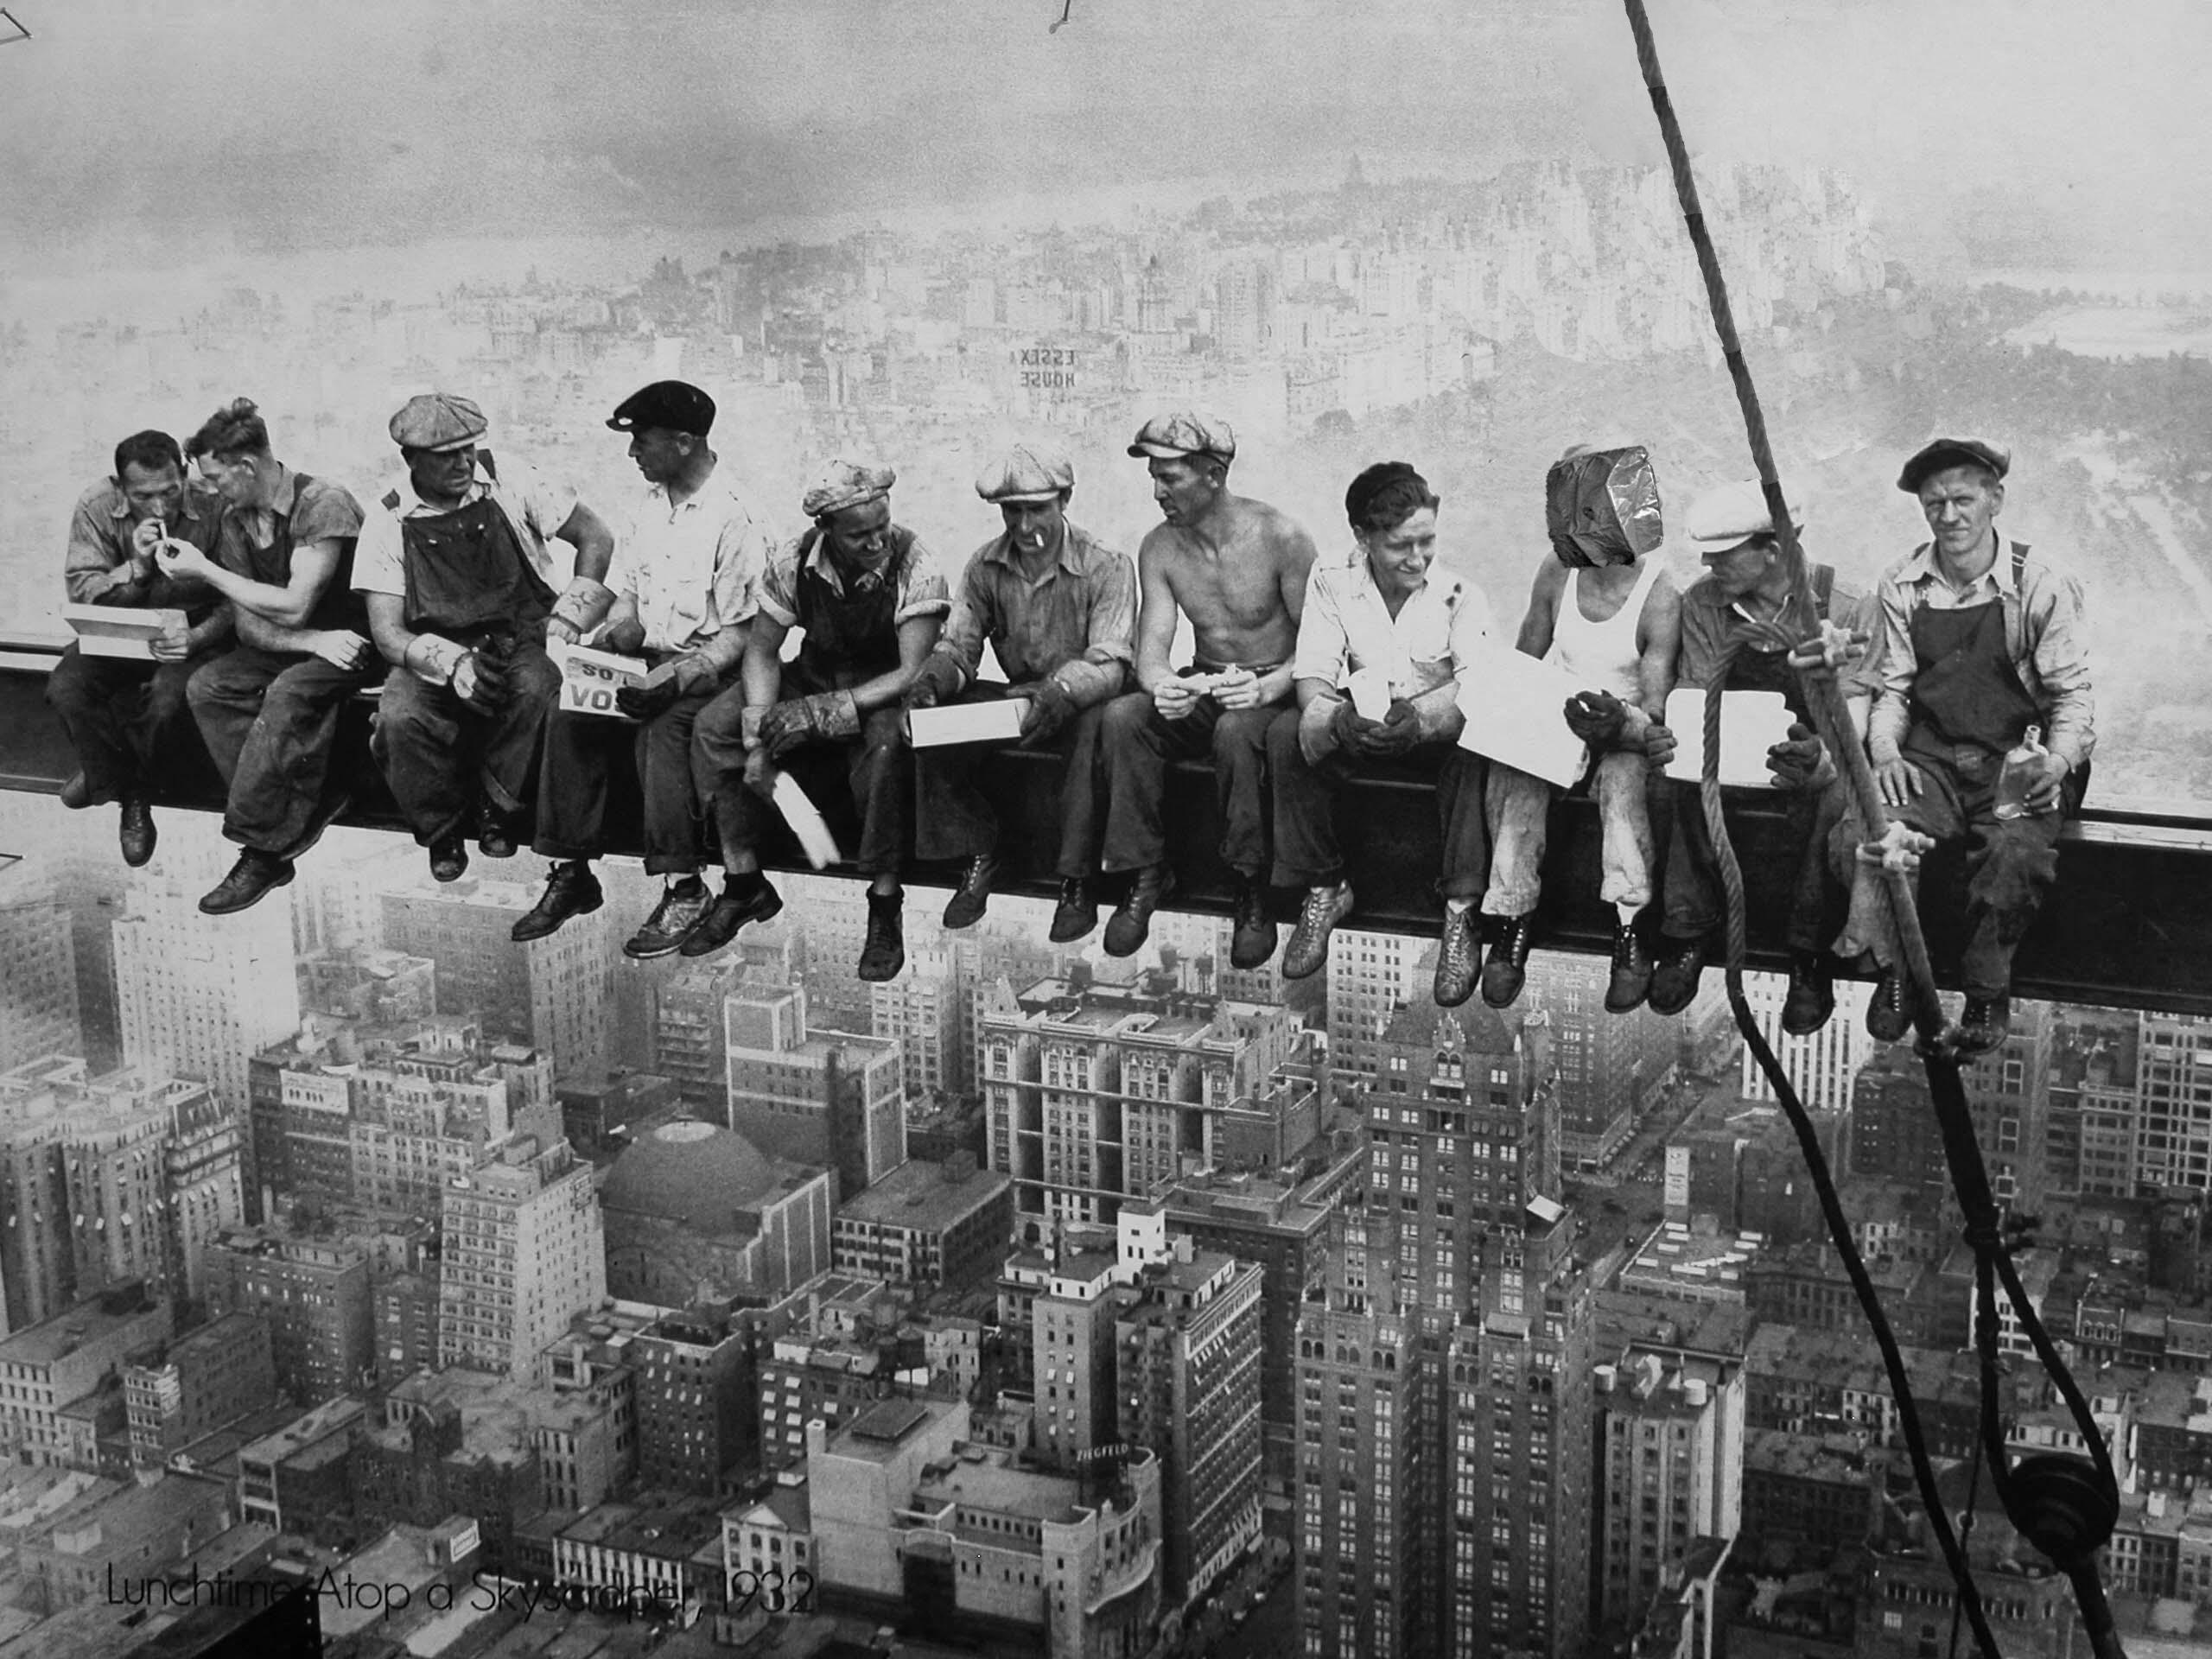 Empire State Building Wallpaper Hd Mr Skyscraper Full Hd Fond D 233 Cran And Arri 232 Re Plan